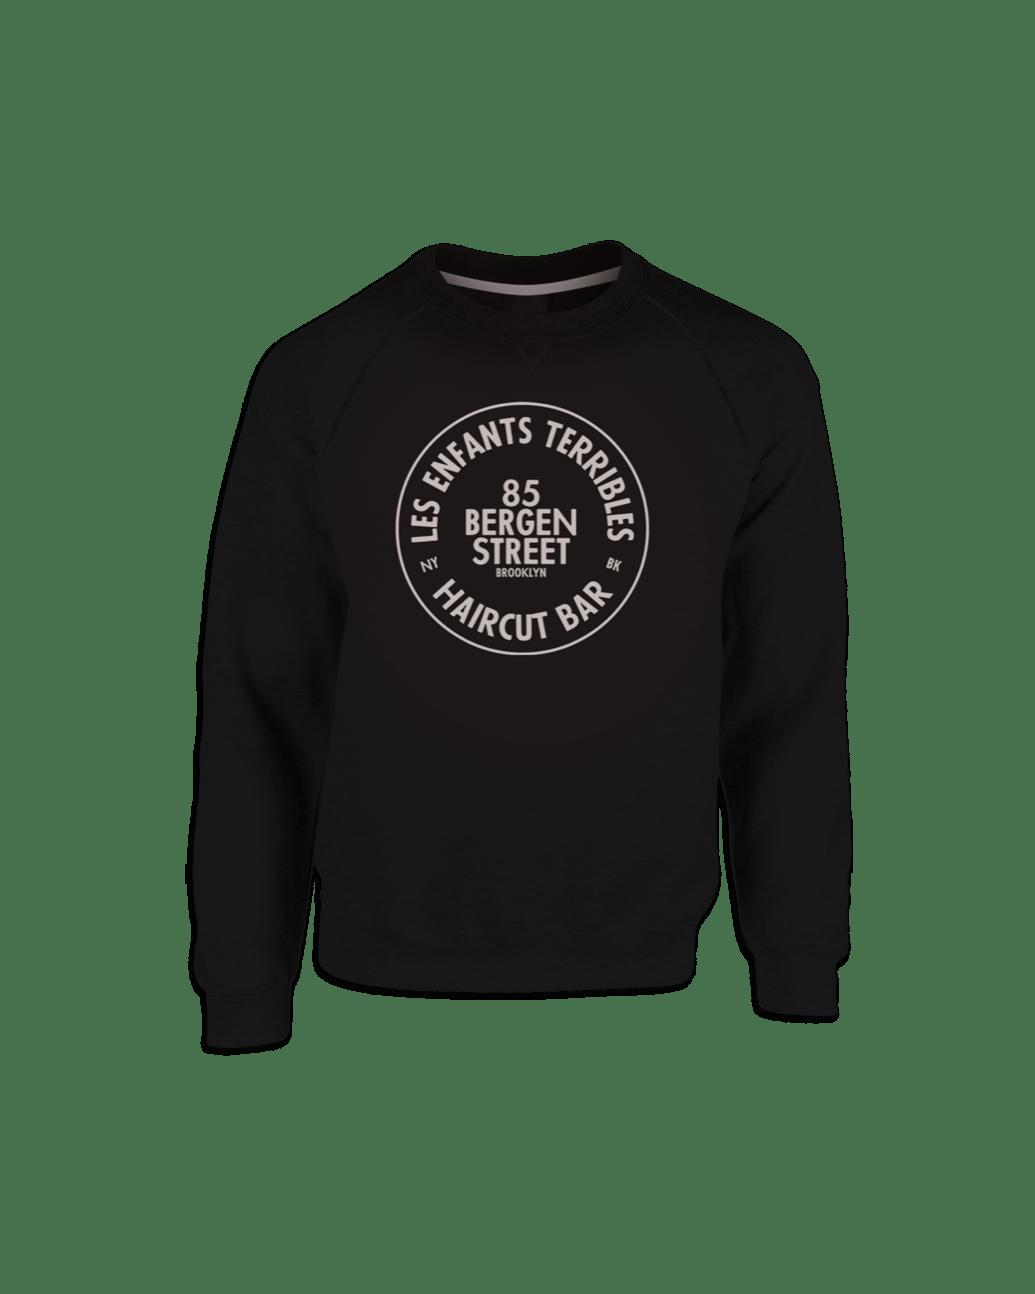 Les Enfants Terribles sweatshirt packshot.